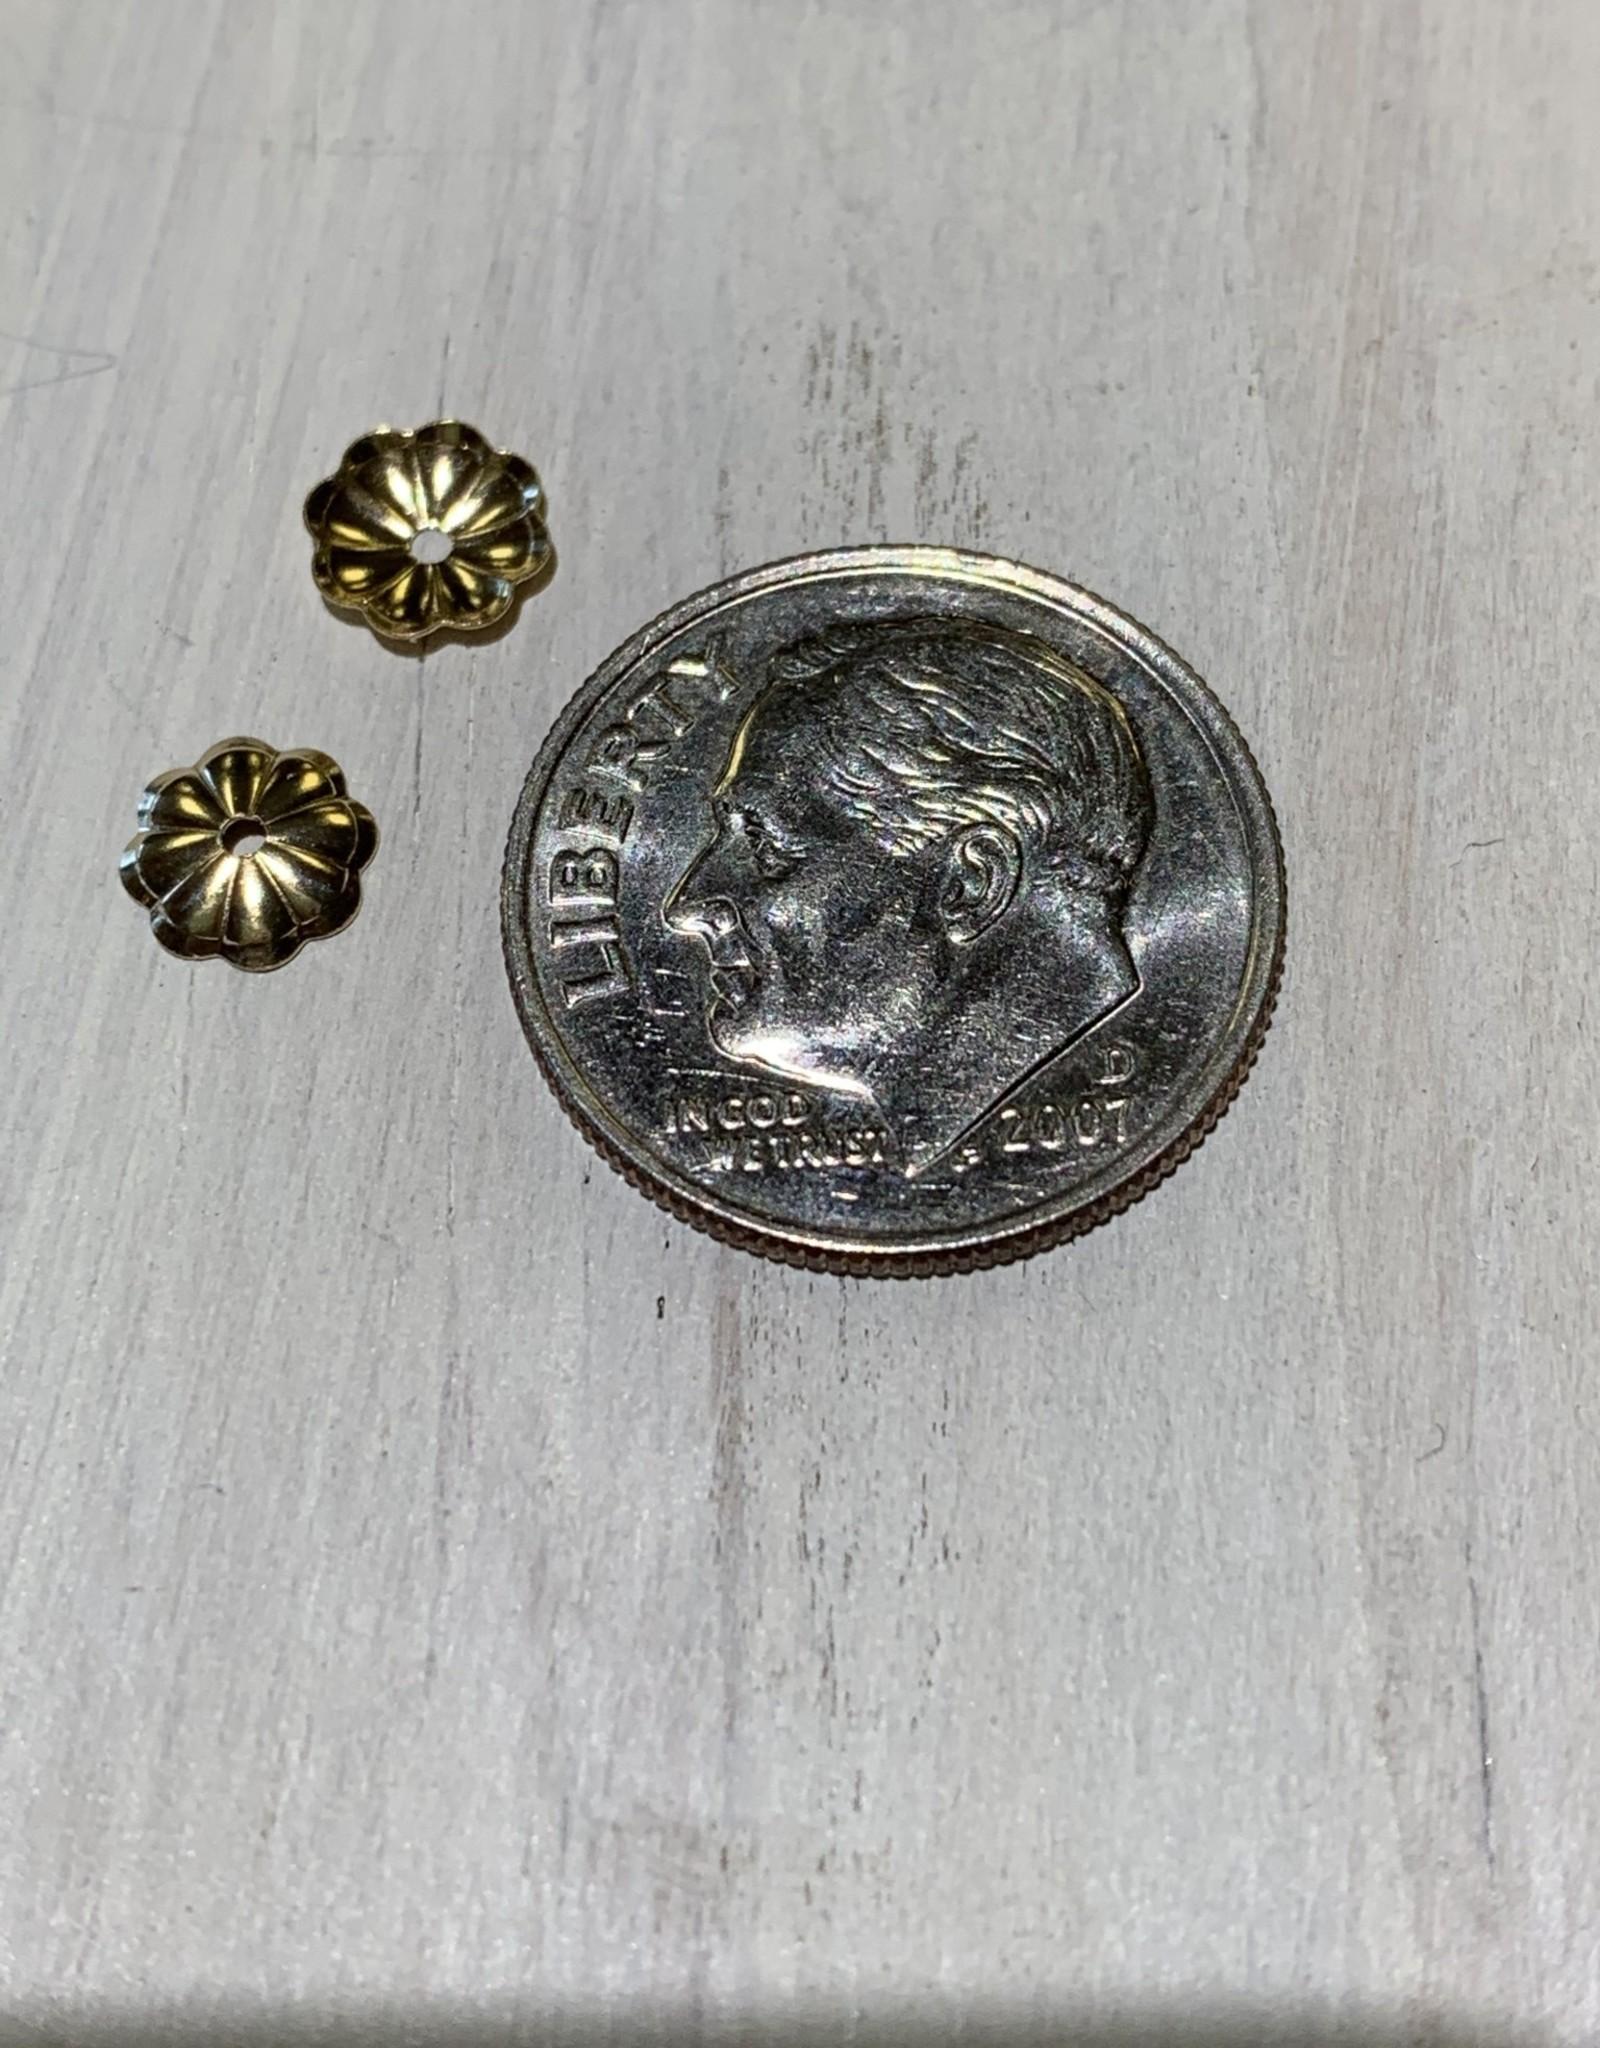 6mm Bead Cap 14k Gold Filled Qty 6